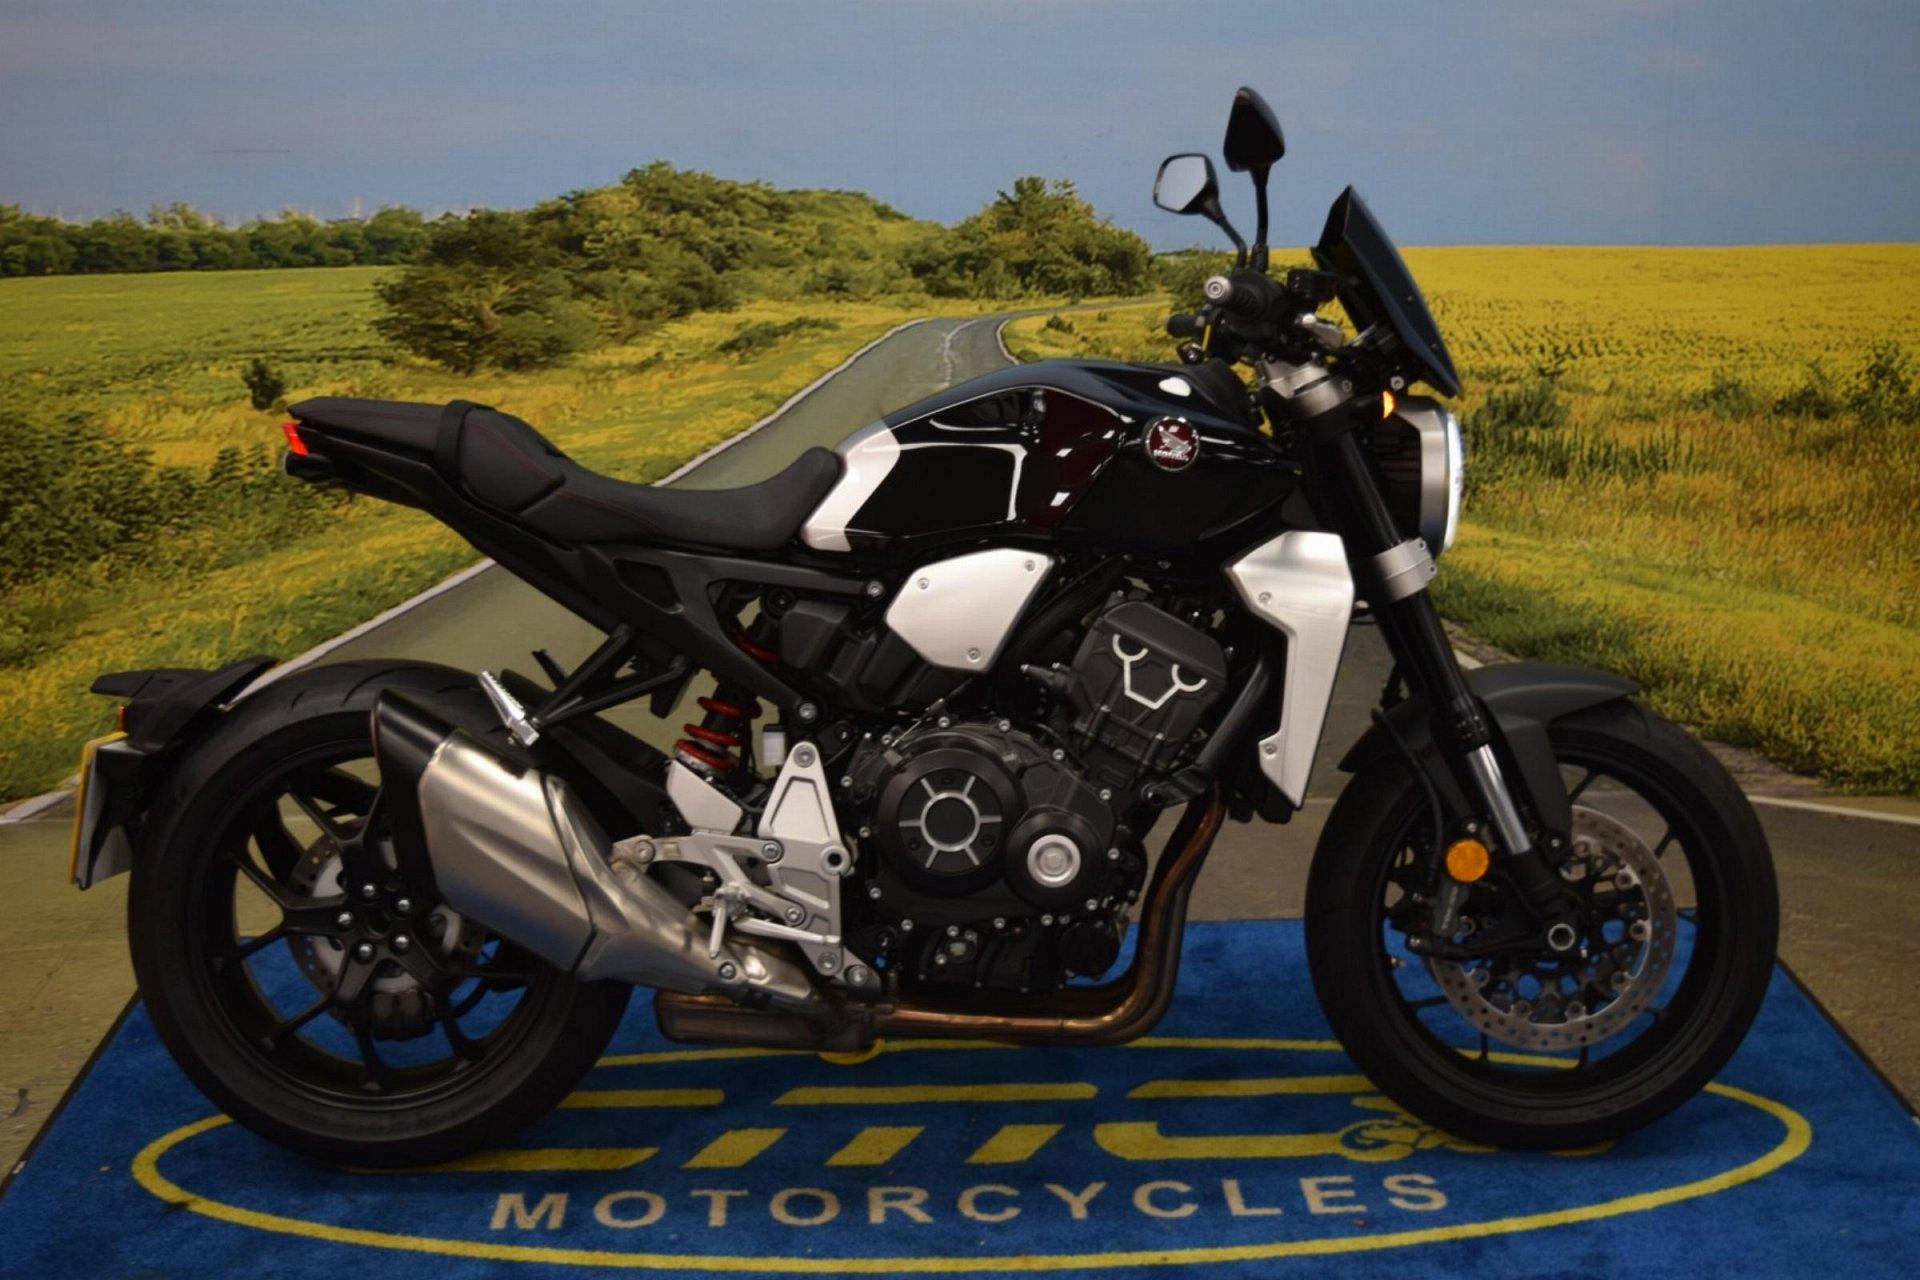 2018 Honda CB1000R for sale in Staffordshire